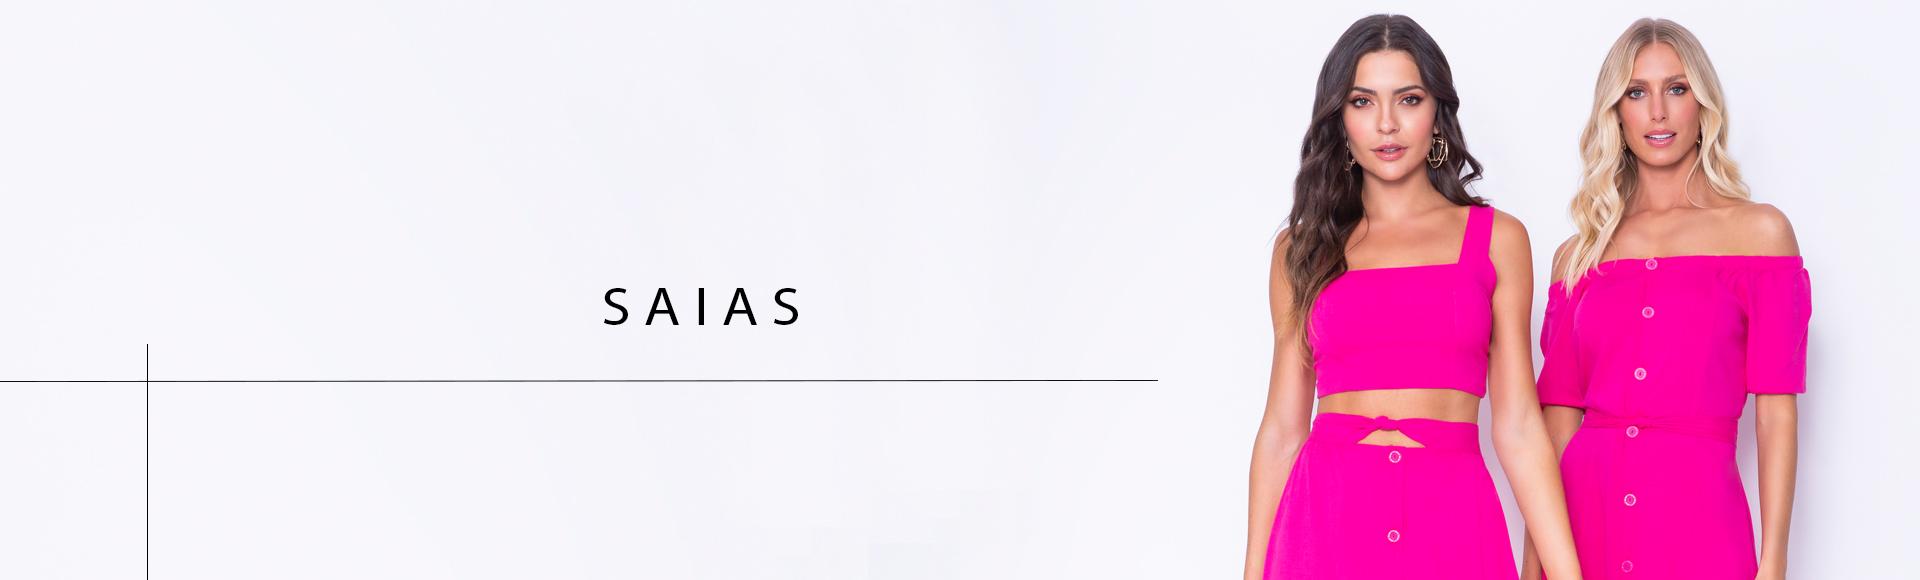 Banner-Saias